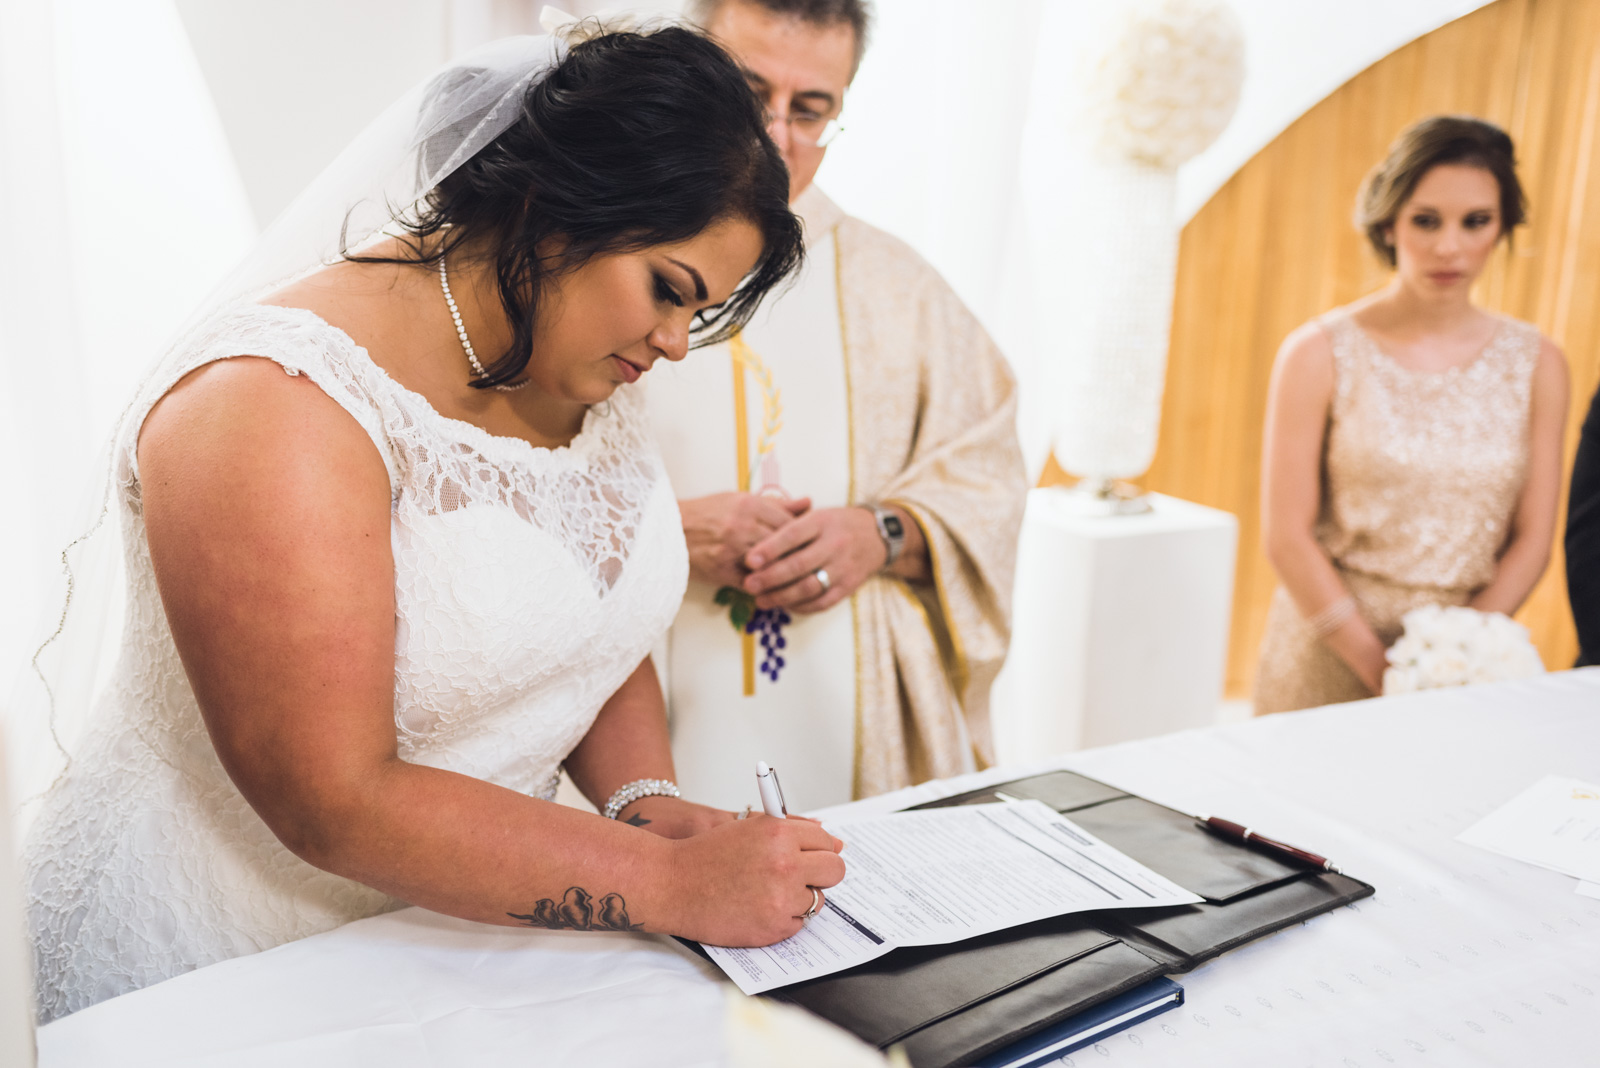 rheana-chris-wedding-blog-152.jpg